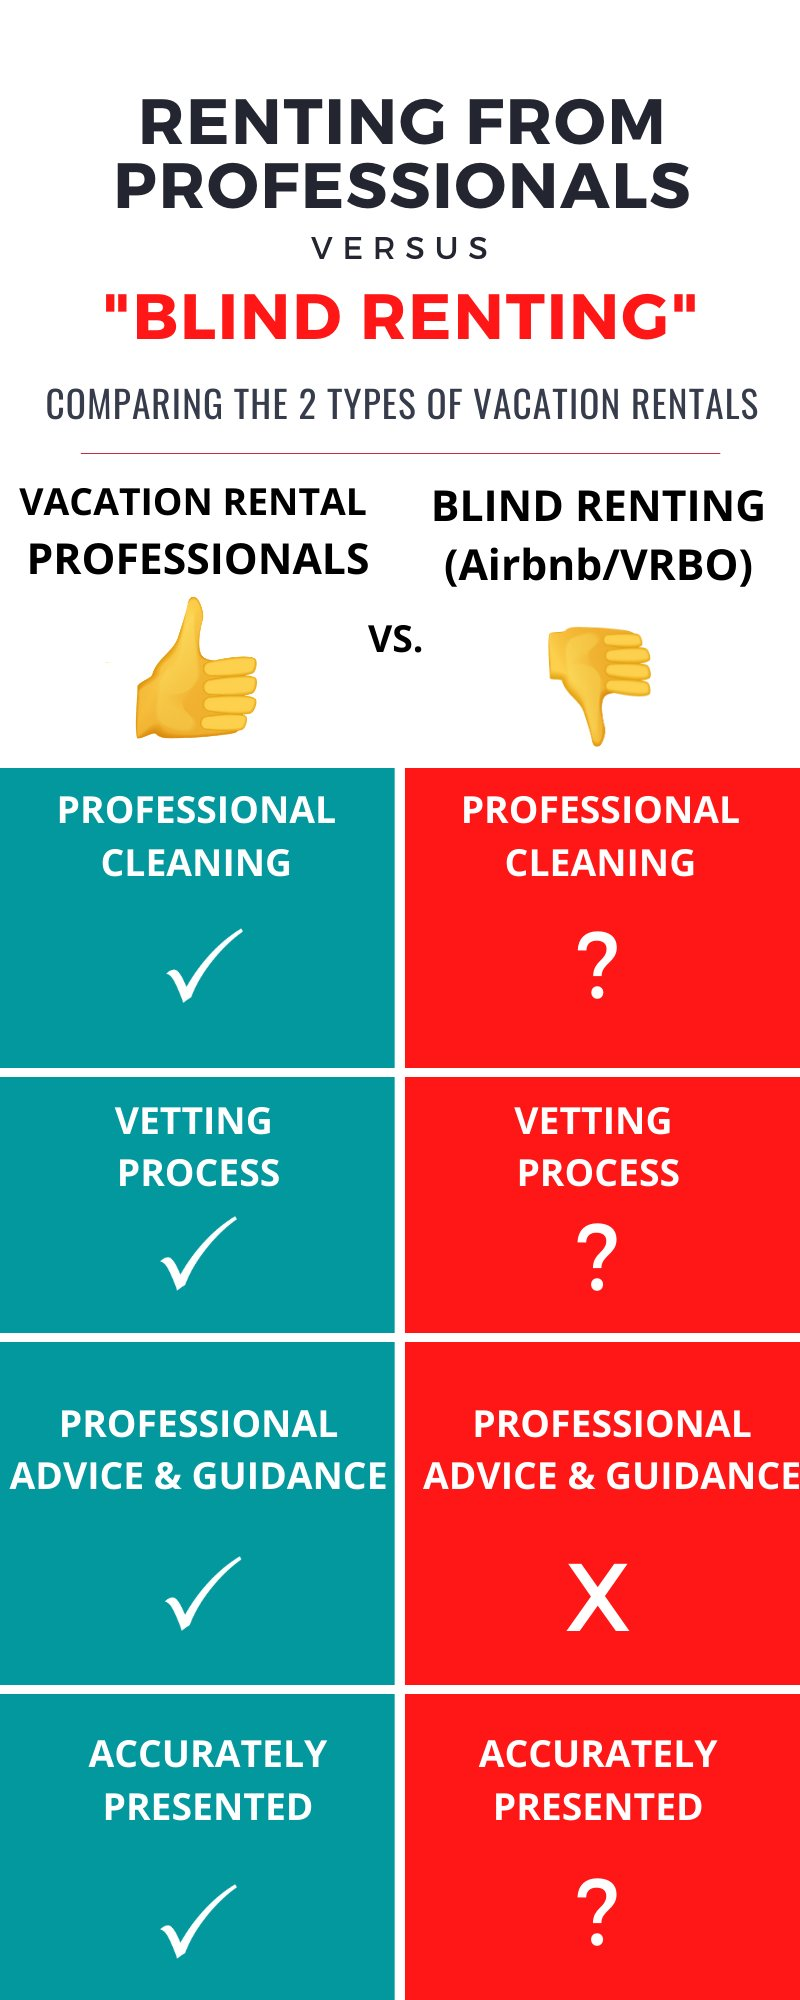 Rental Professionals vs. Blind Renting